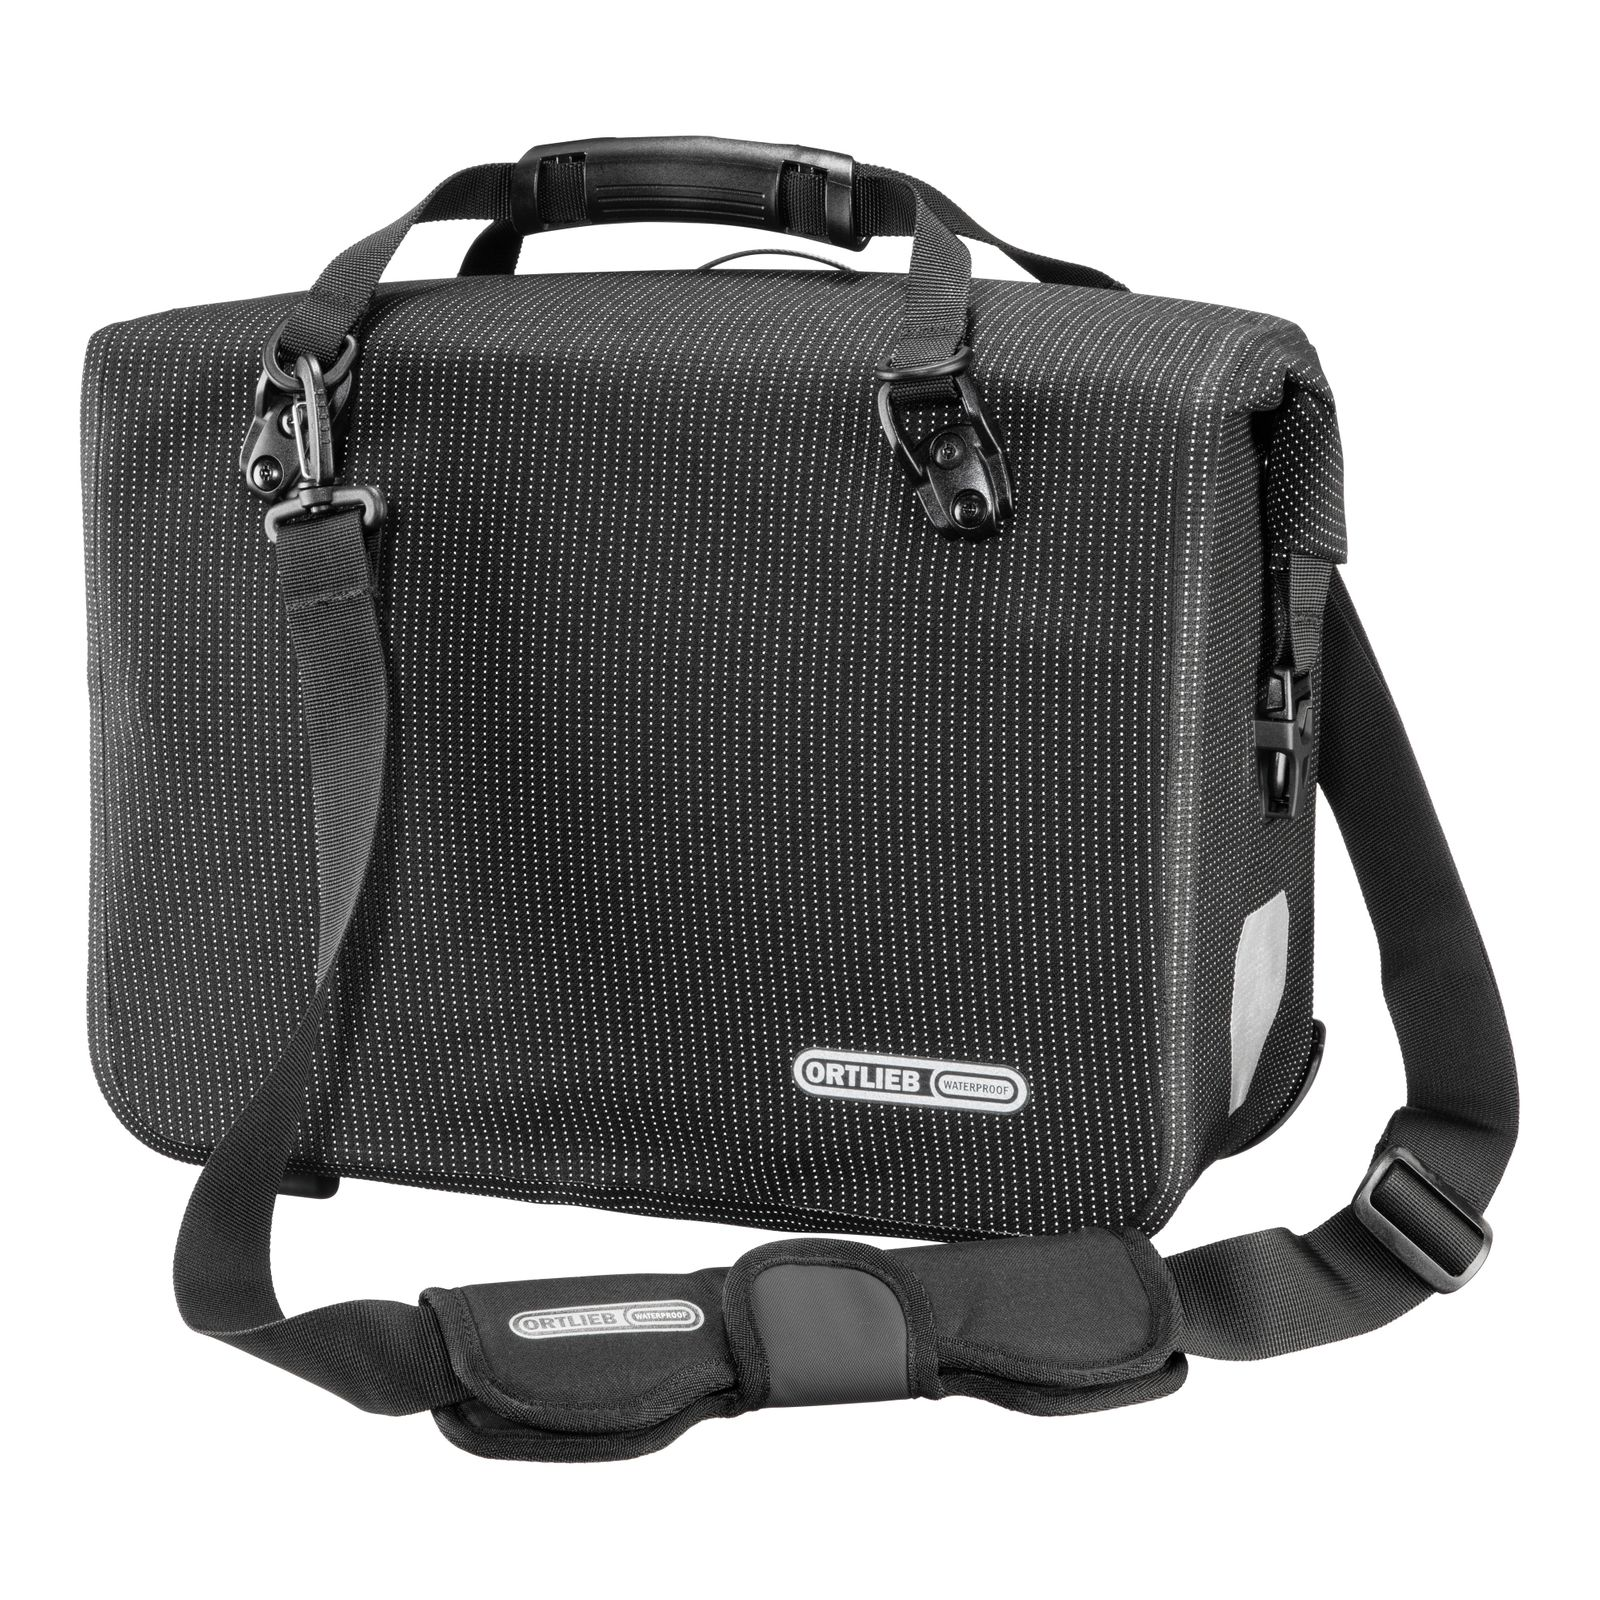 ORTLIEB High Visibility Office Bag Bike Side Pannier (QL3.1) 21L - Single Black Reflective